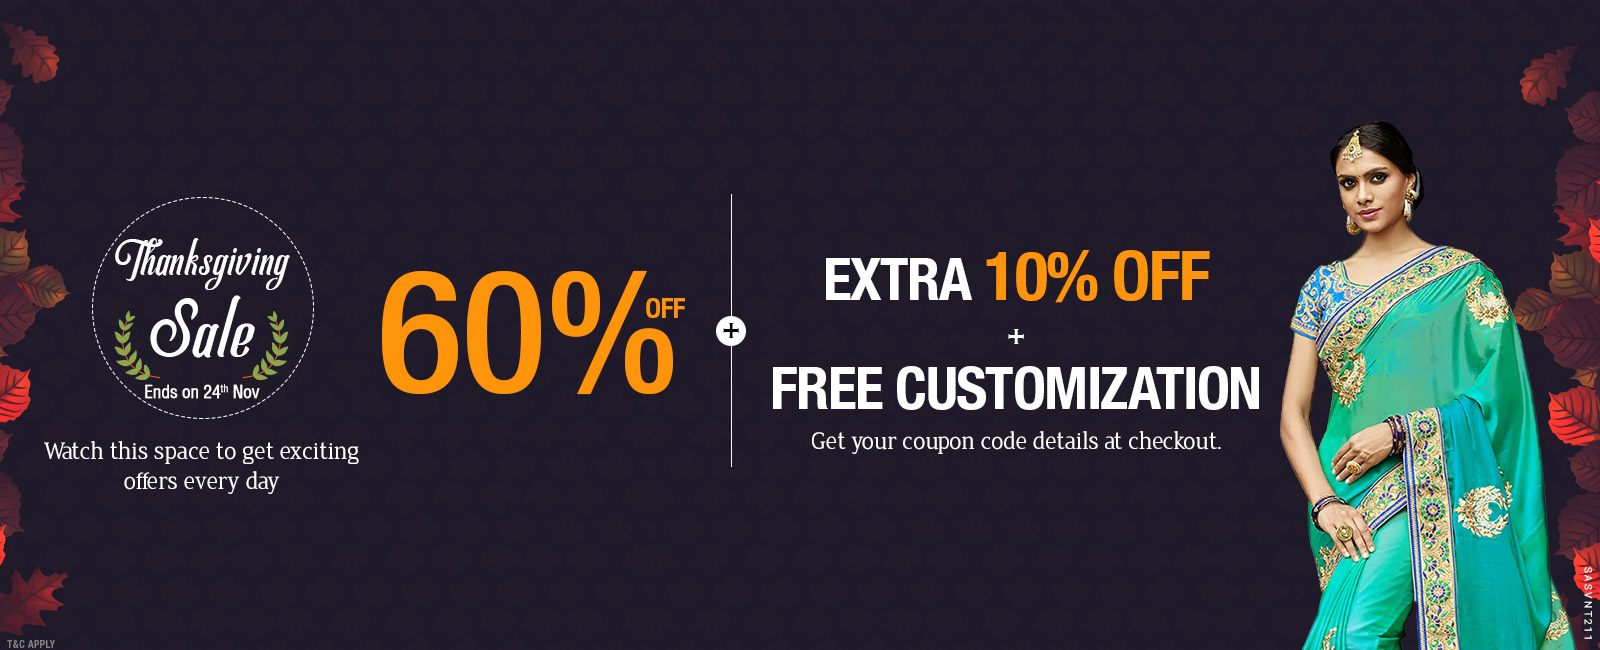 60% Off + Extra 10% Off + Free customization